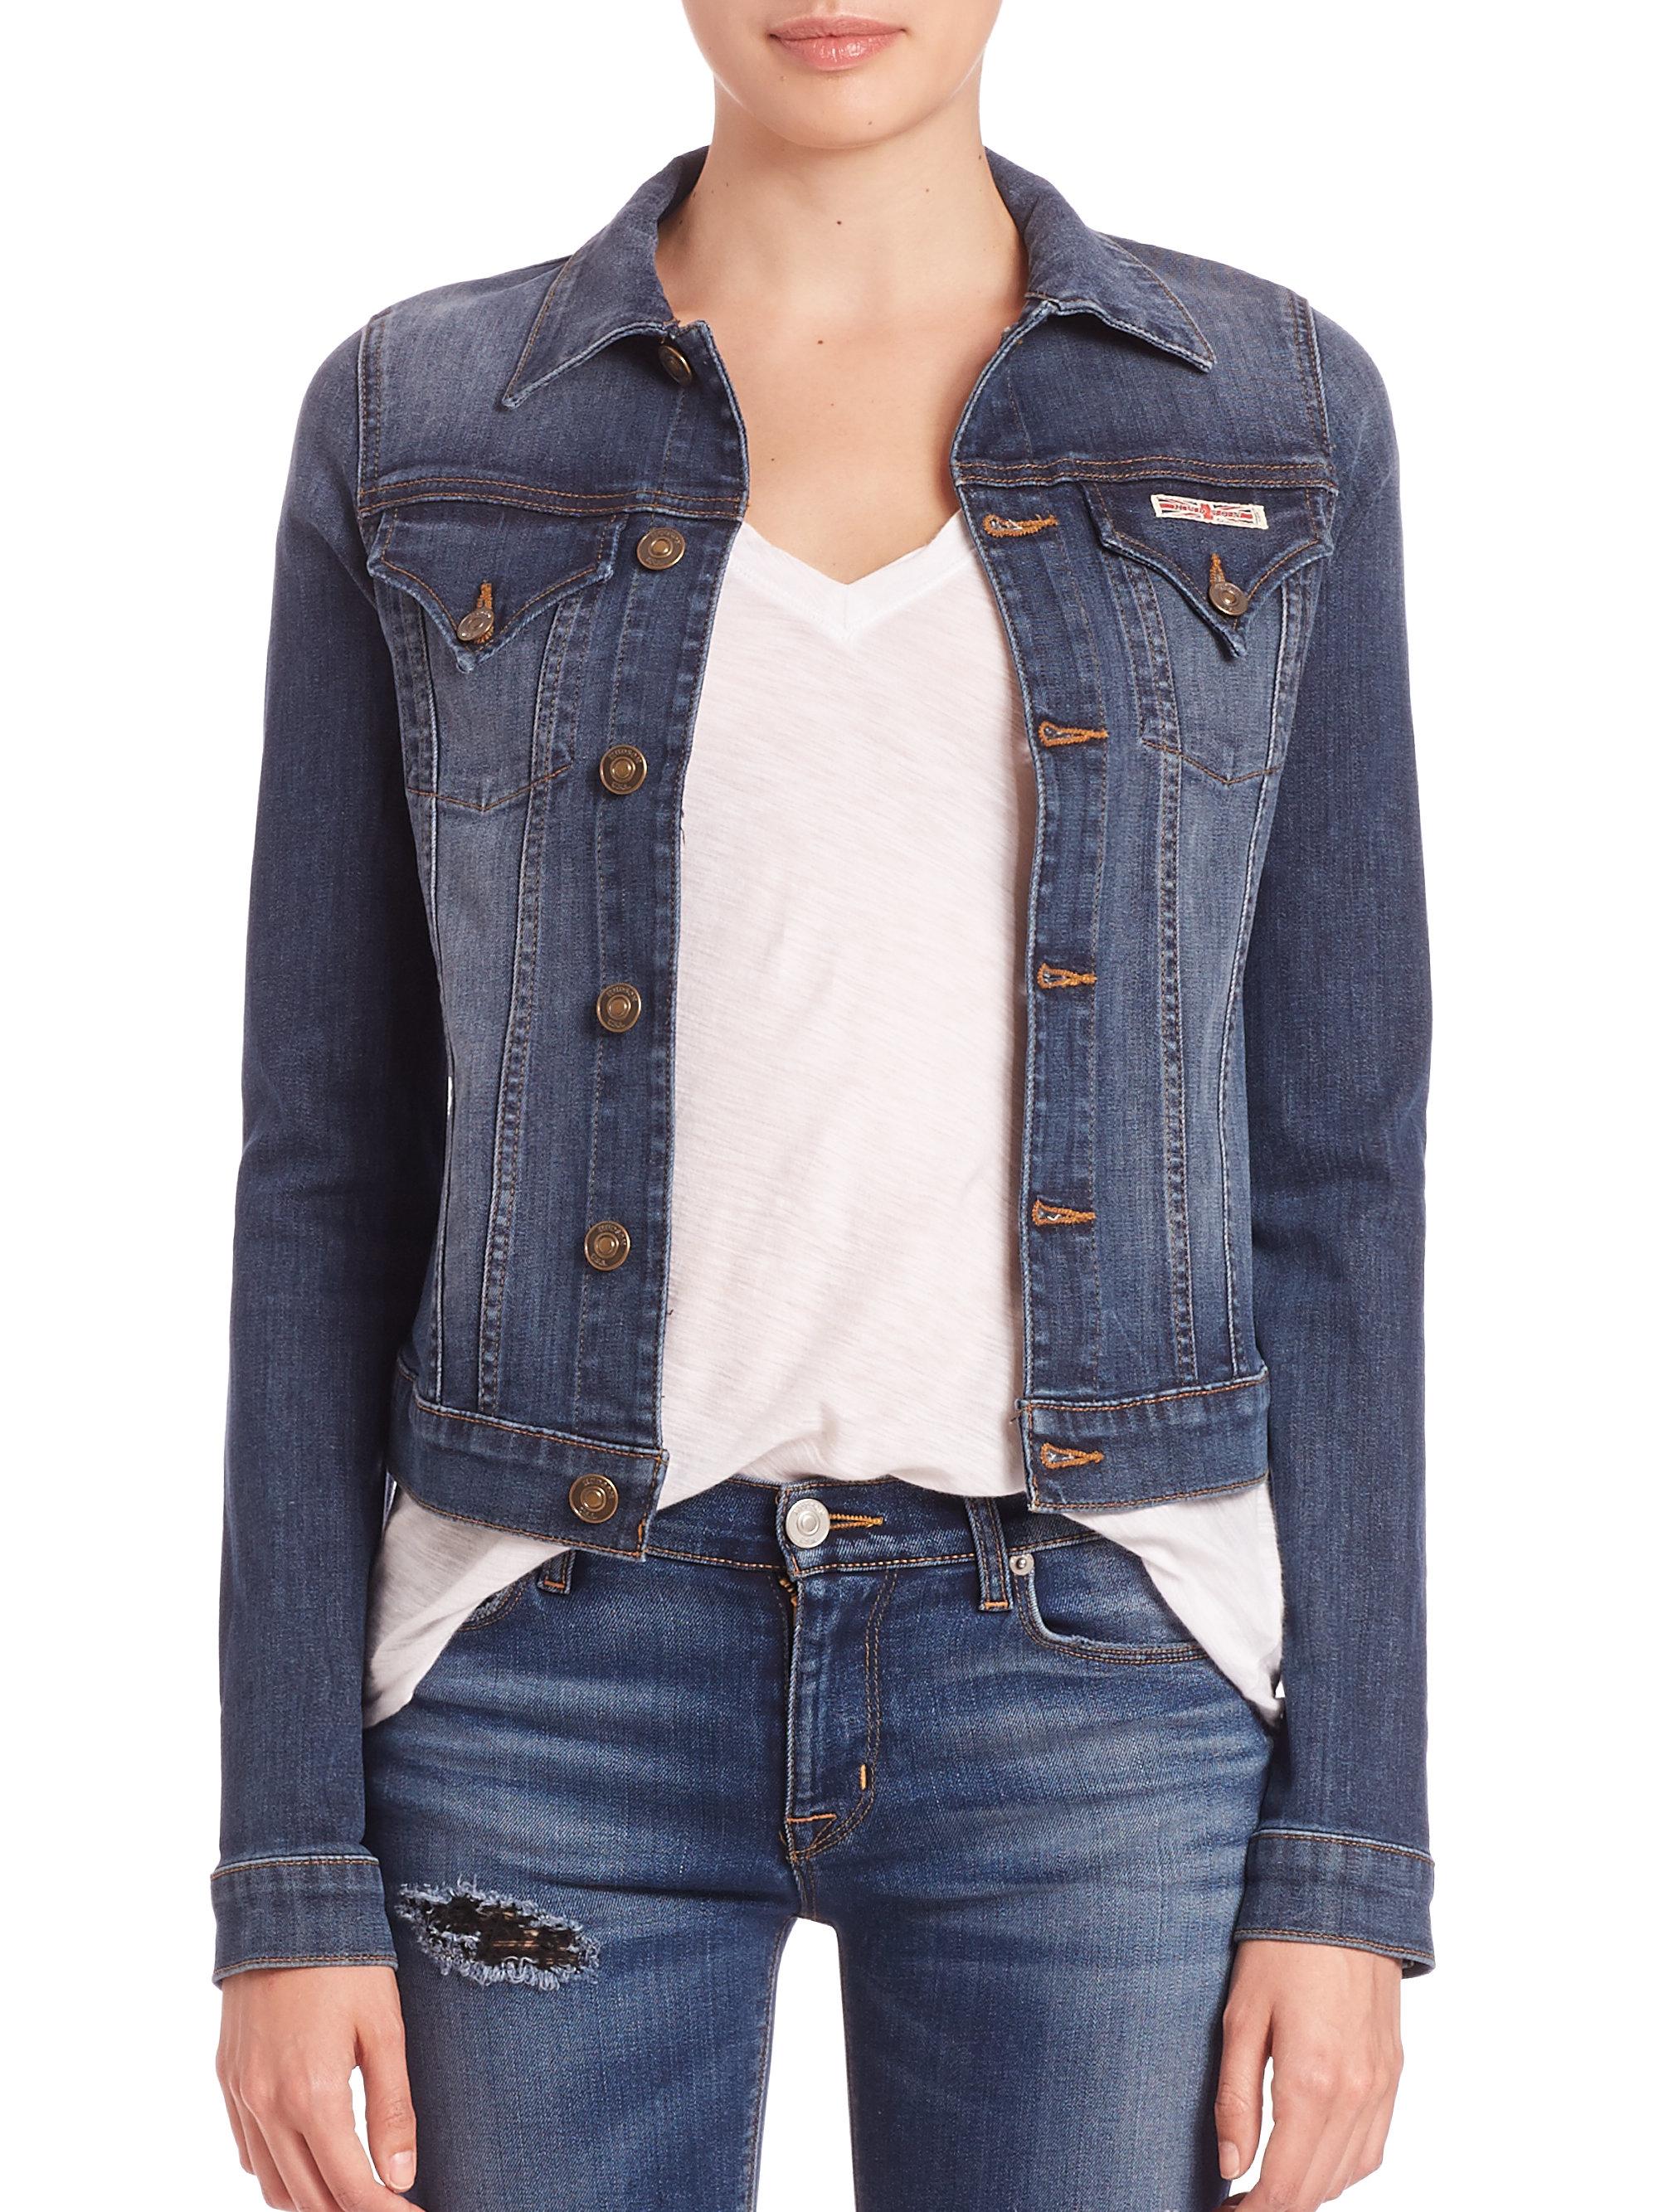 Lyst - Hudson jeans Signature Denim Jacket in Blue